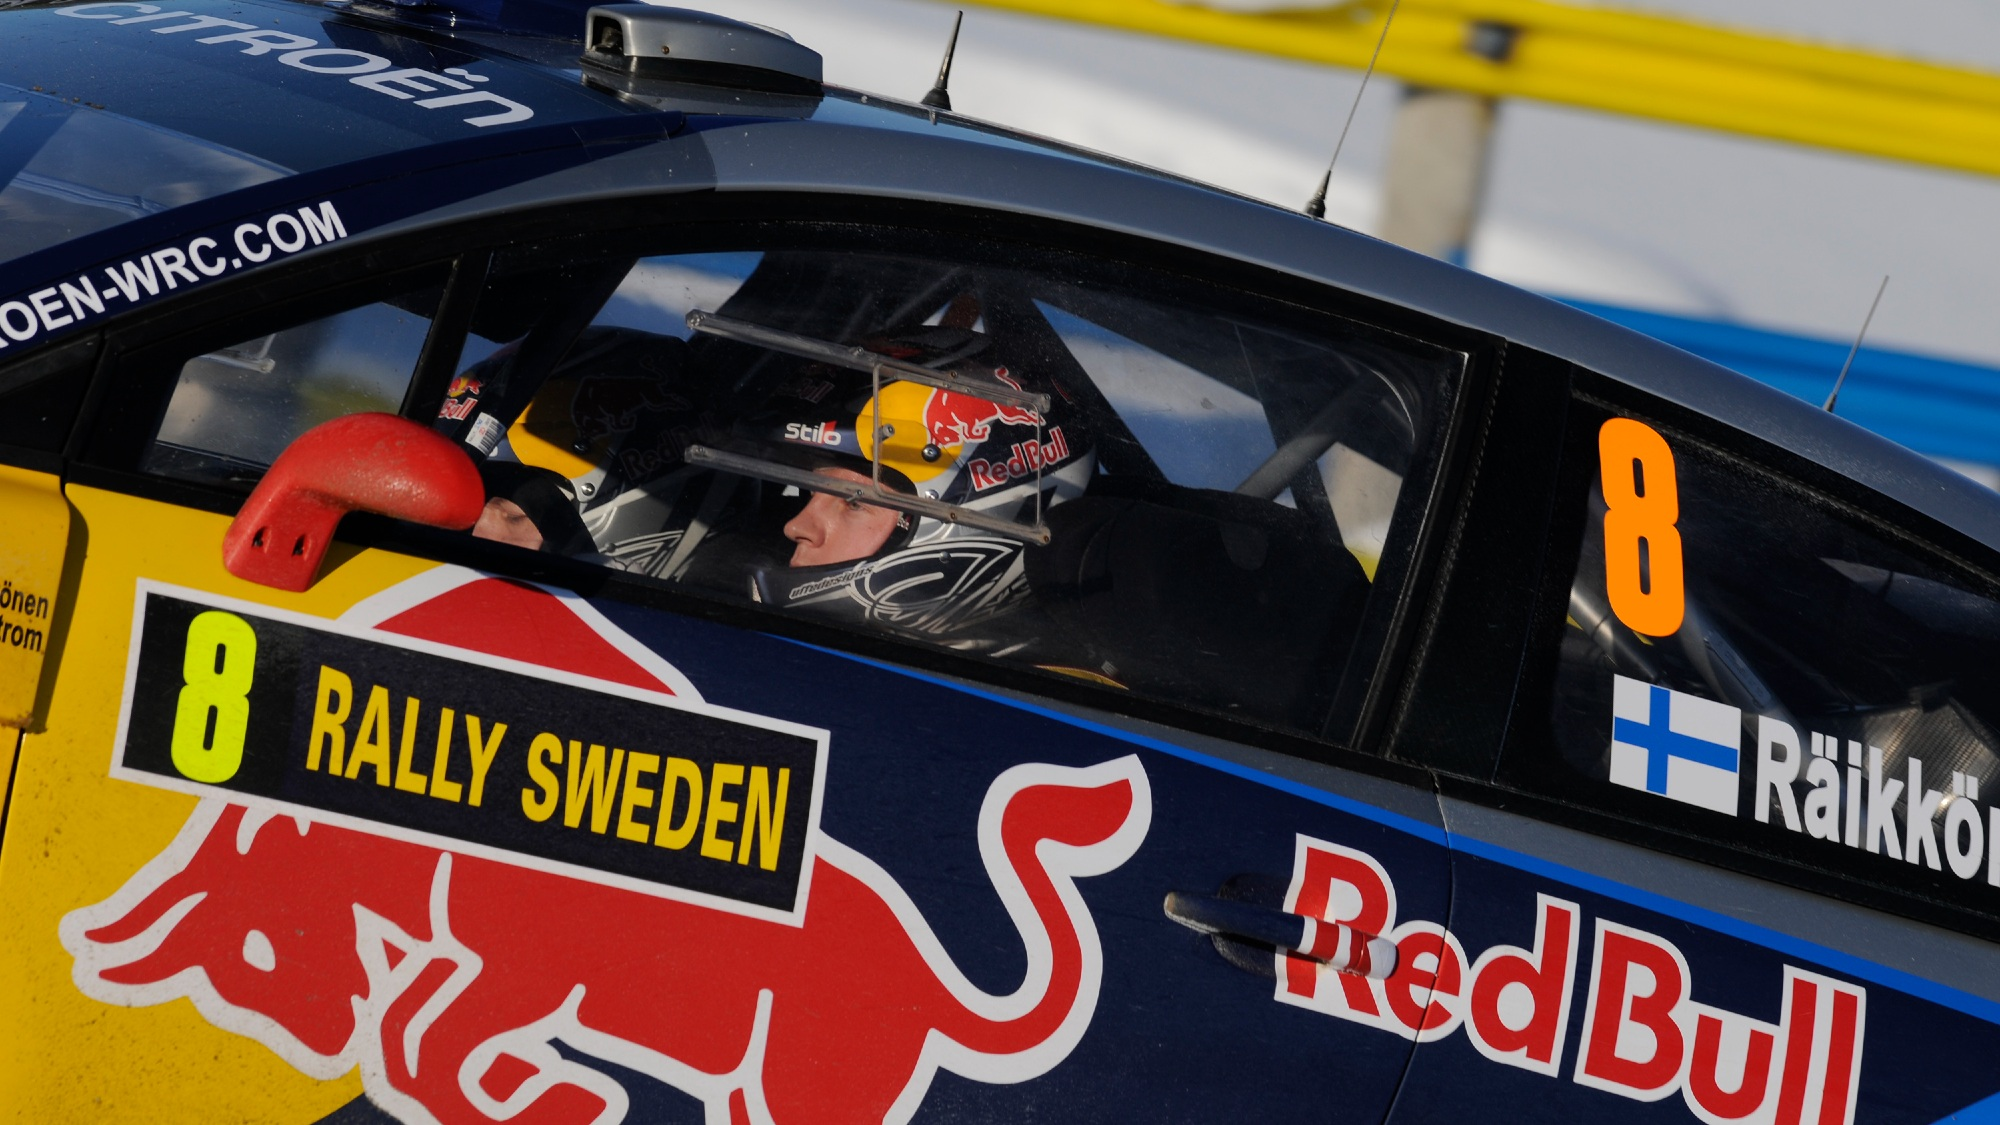 Kimi Raikkonen, 2010 WRC